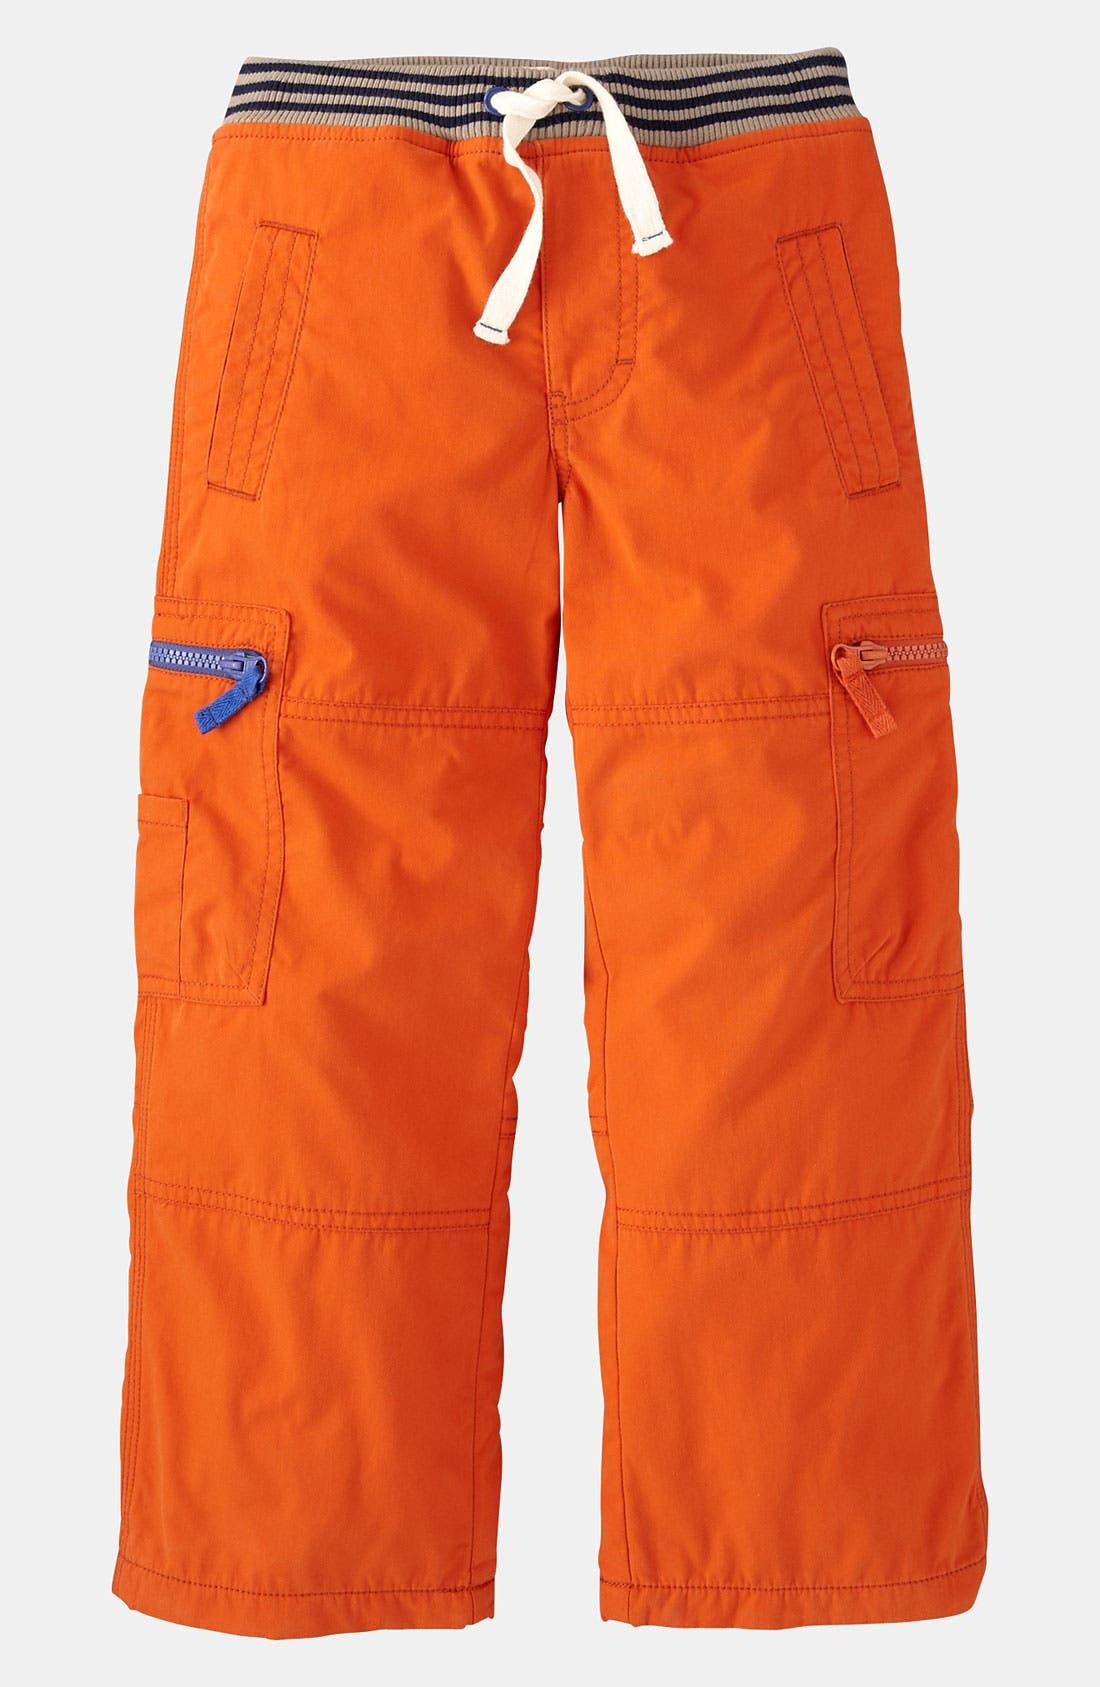 Alternate Image 1 Selected - Mini Boden Lined Cargo Pants (Little Boys & Big Boys)